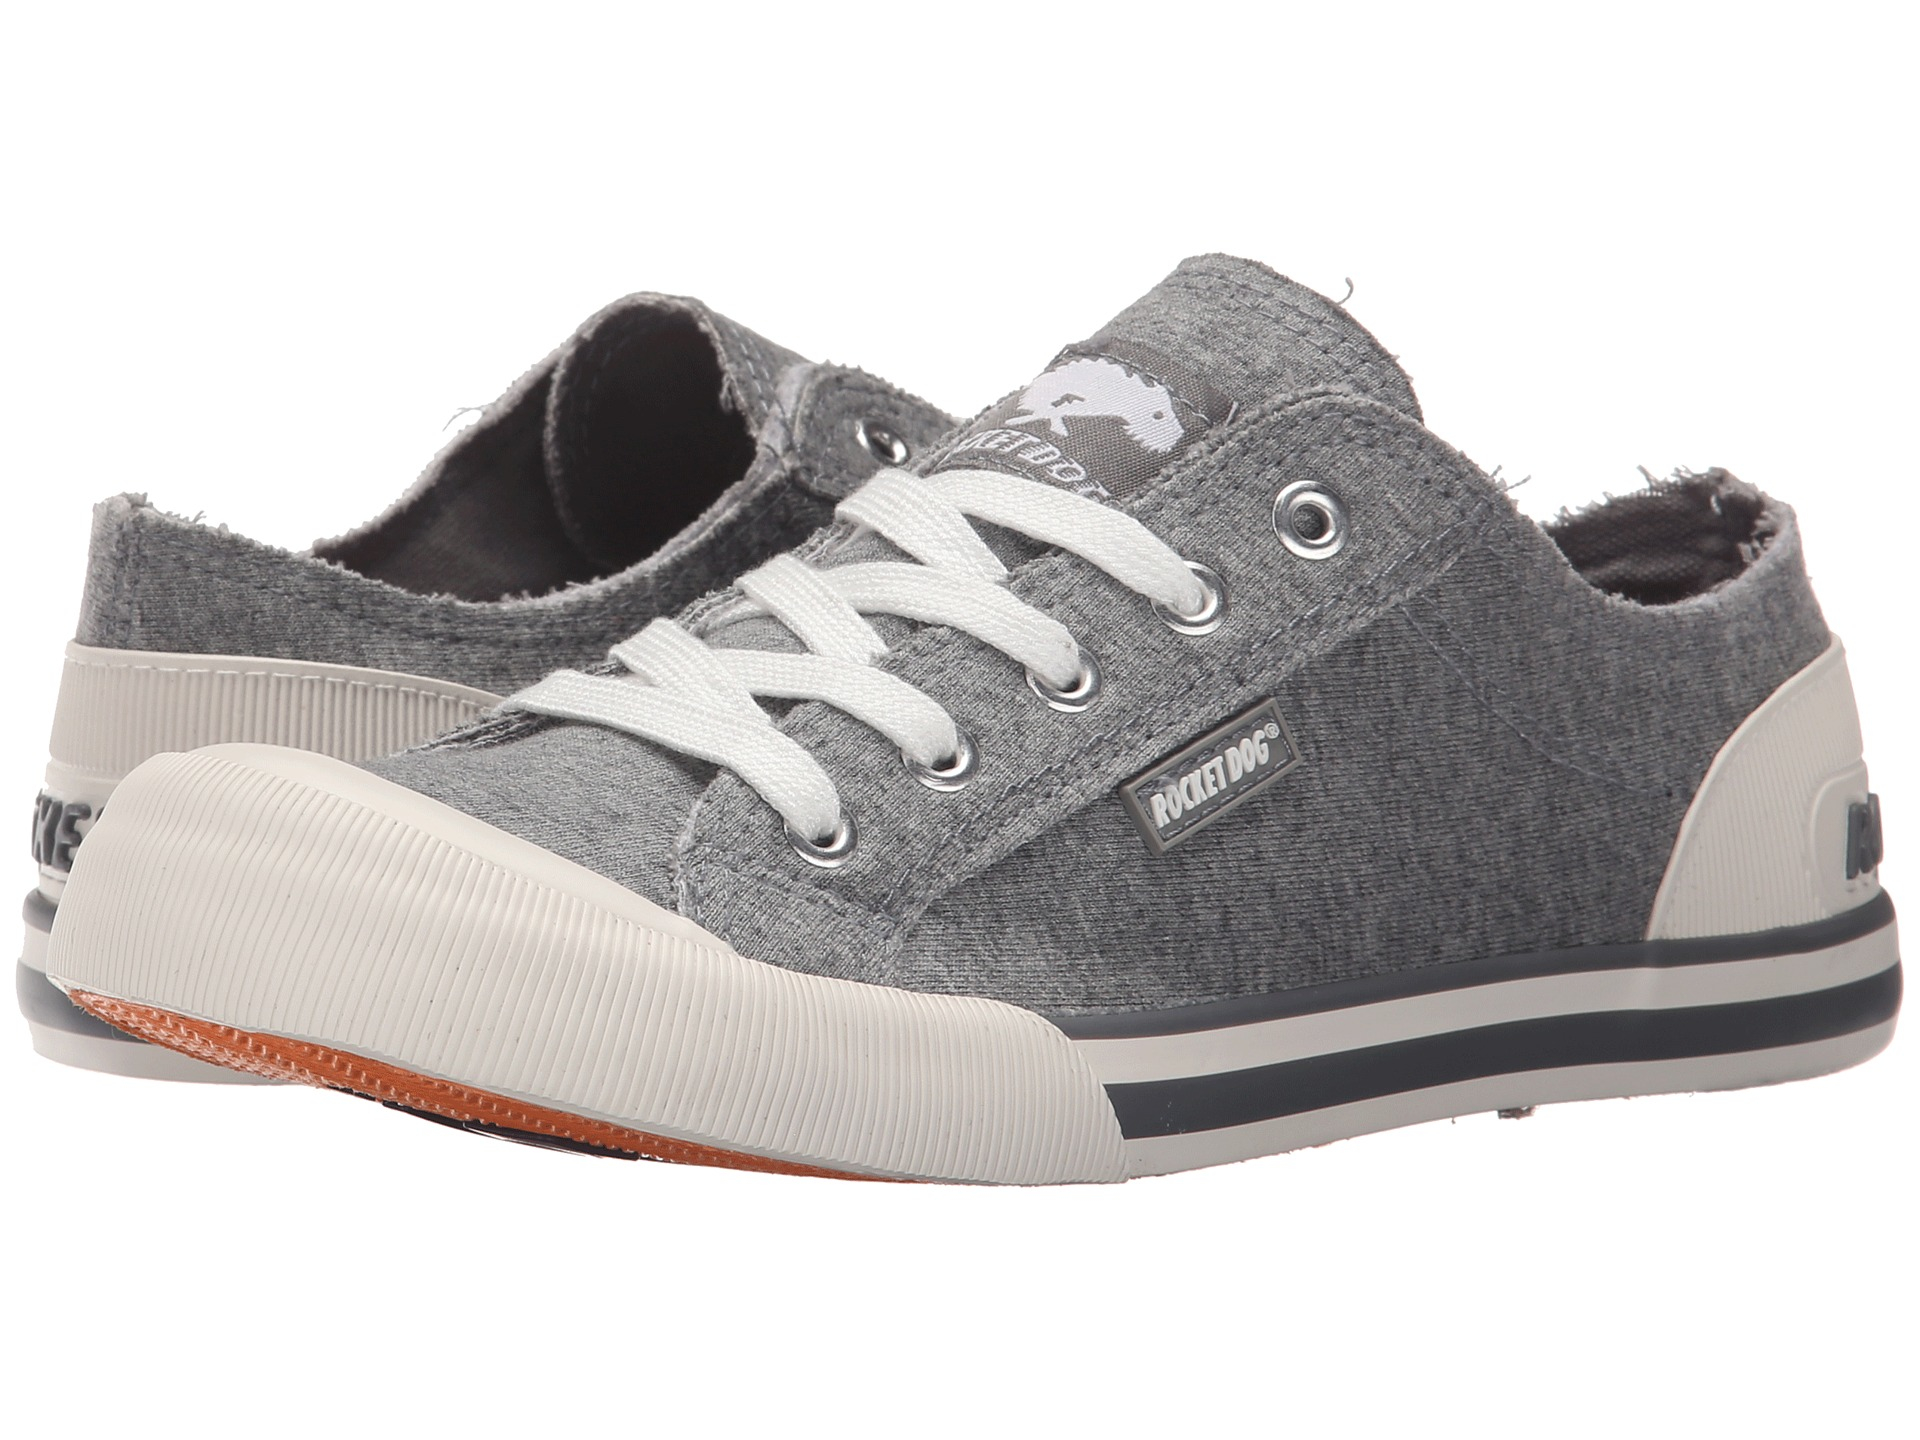 Nike Rocket Shoes